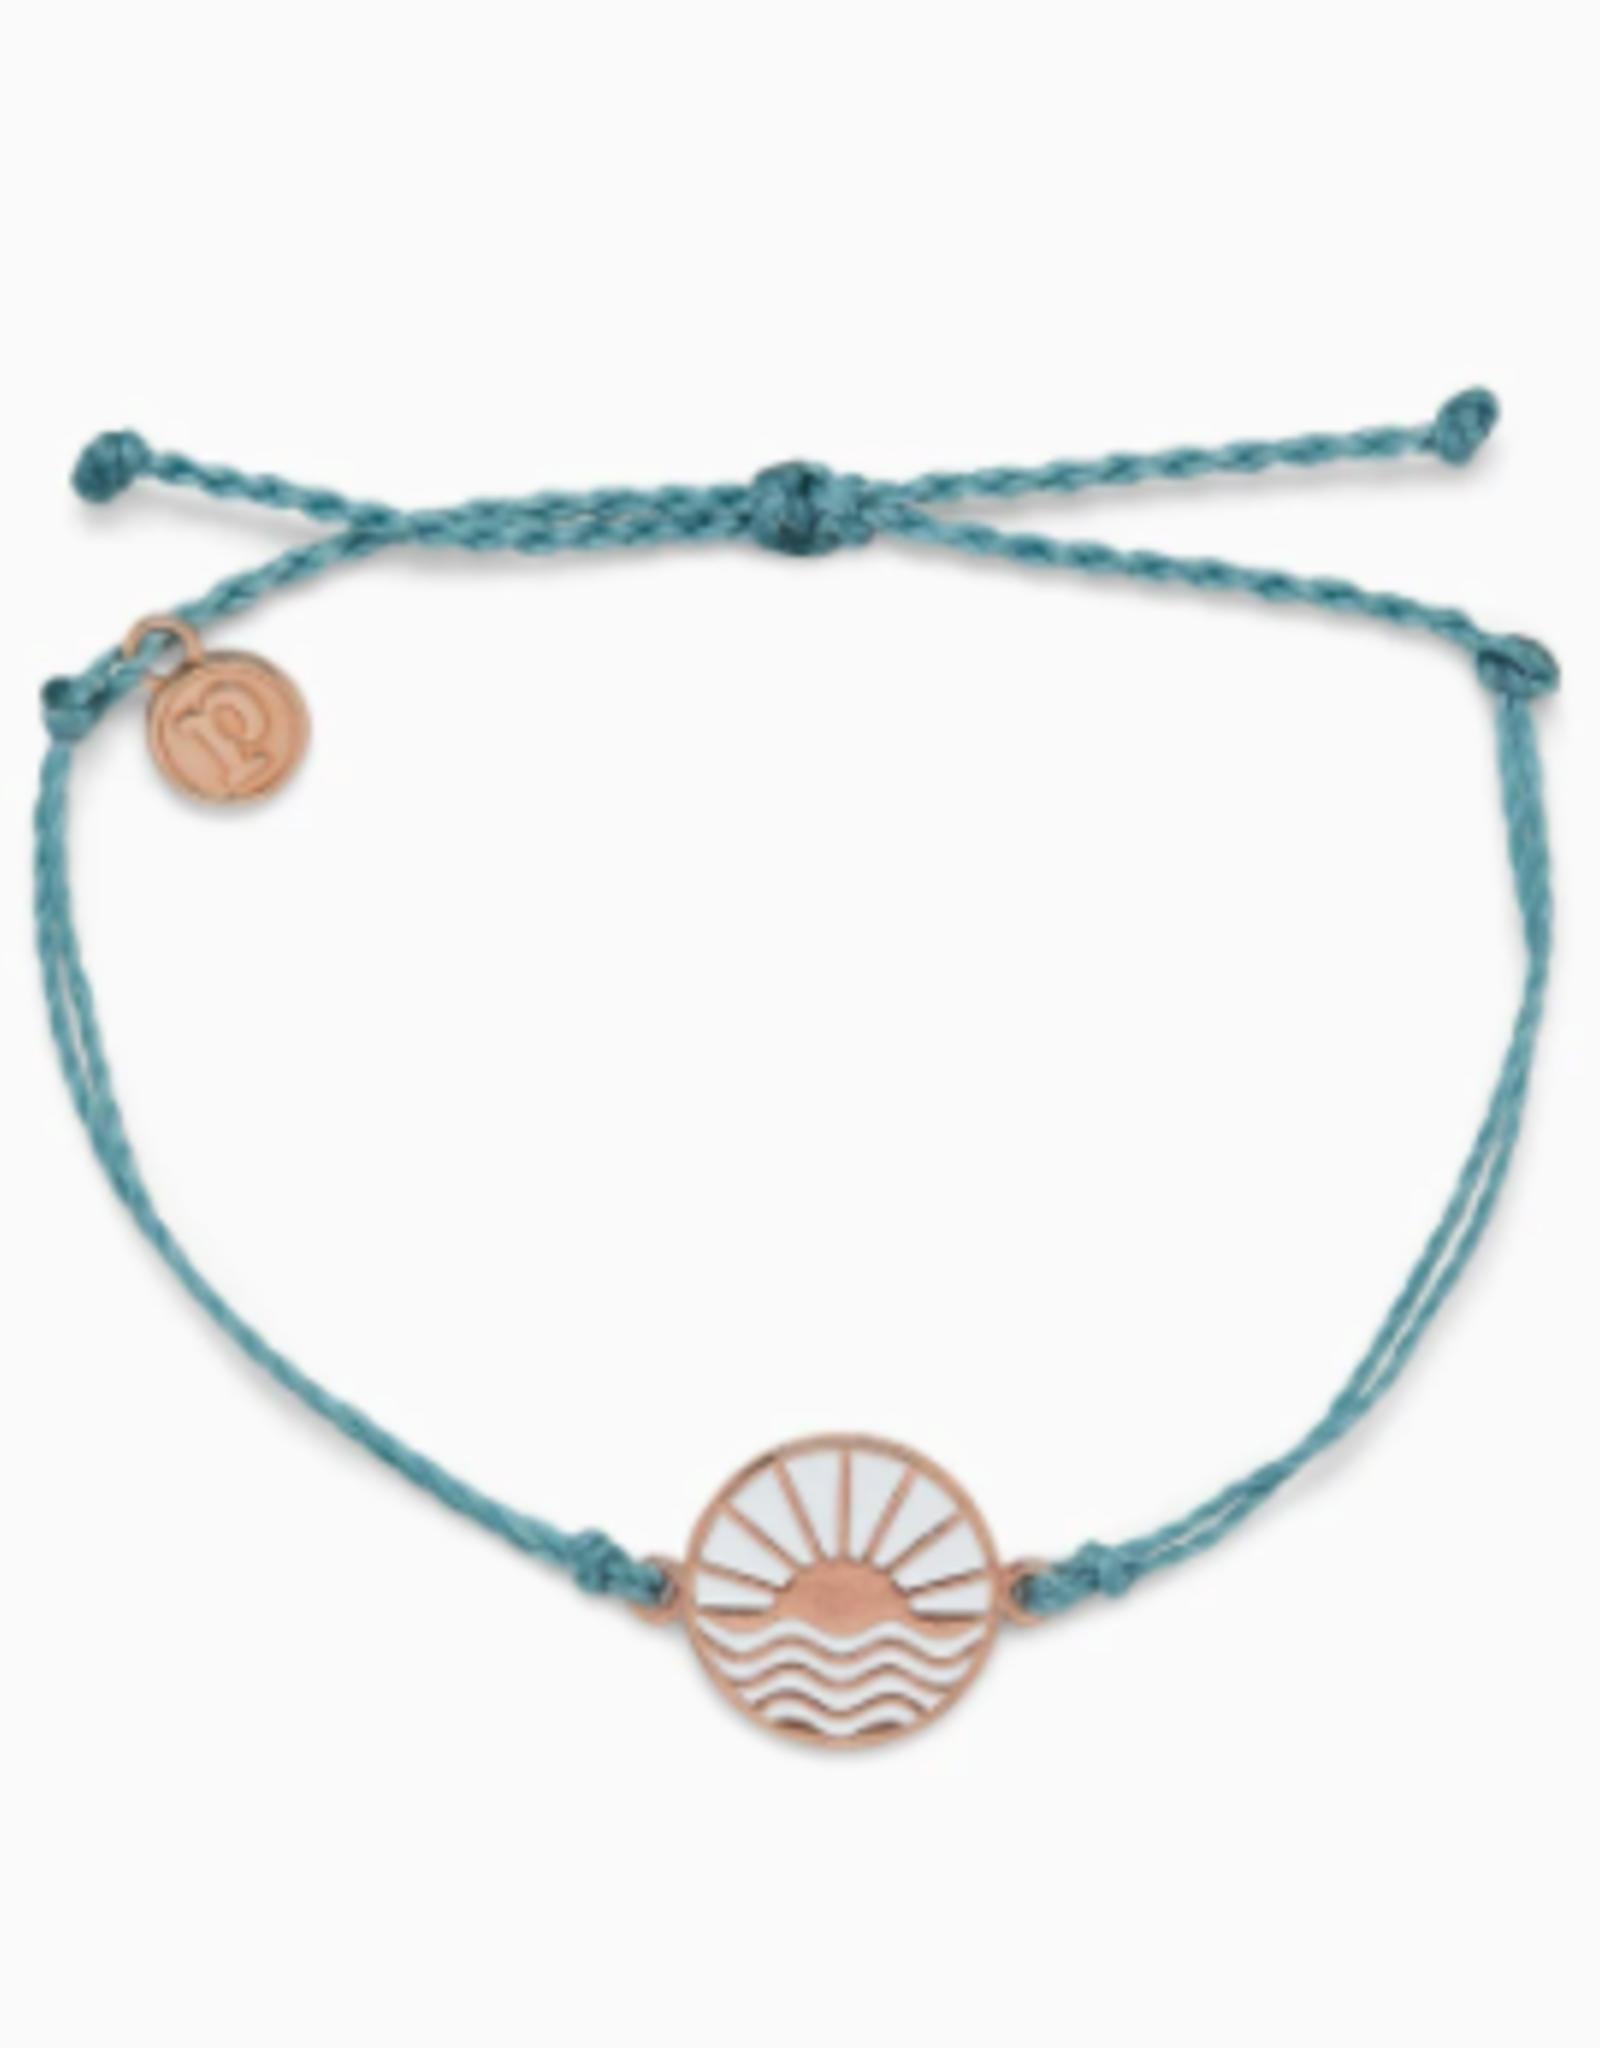 Pura Vida Pura Vida - Charm Bracelet Sunrise Sunset - Smoke Blue